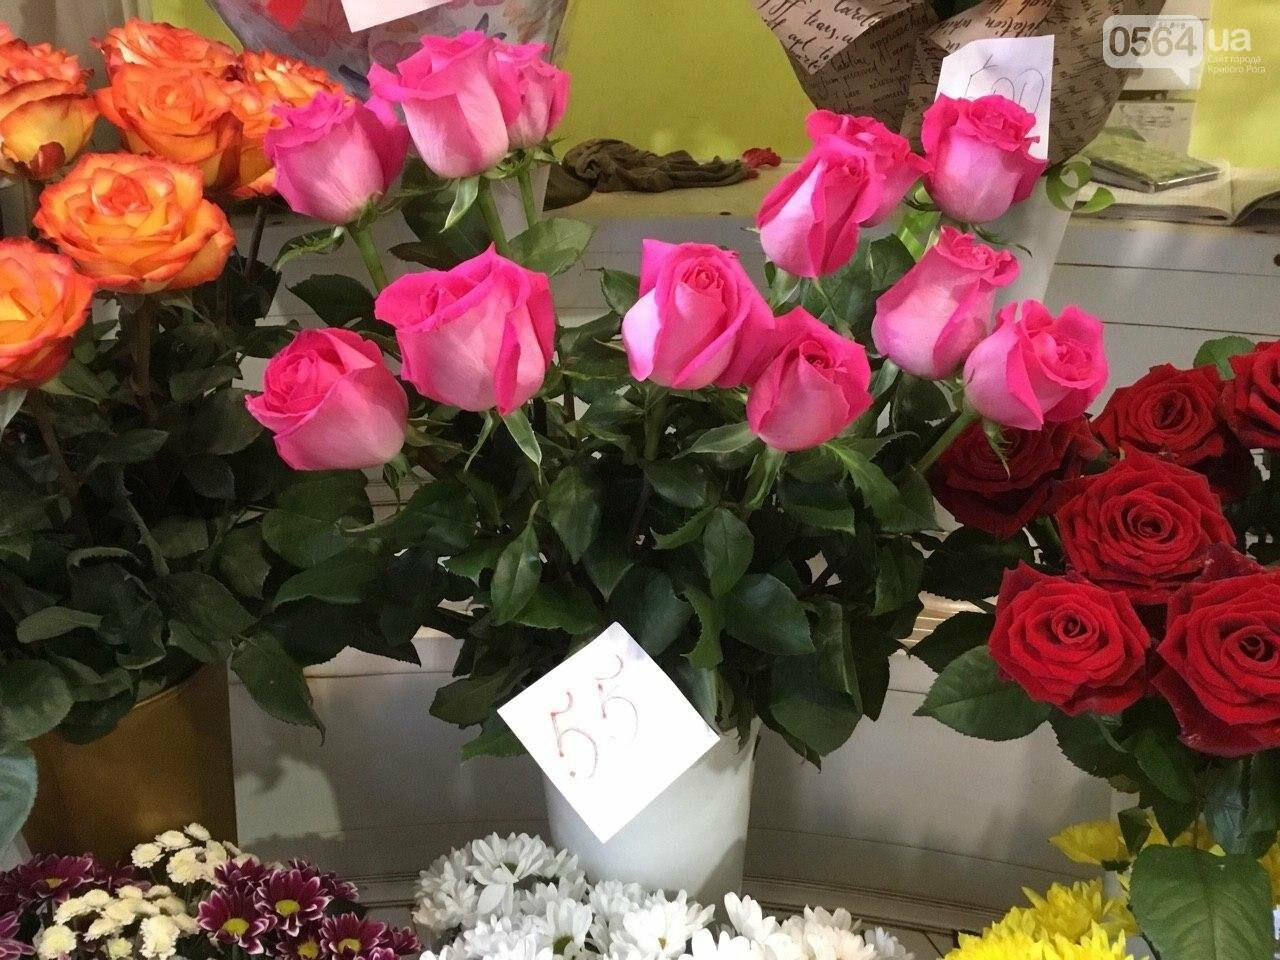 Сколько стоят примула, цикламен, мимоза? Обзор цен на цветы в Кривом Роге, - ФОТО, ВИДЕО, фото-11